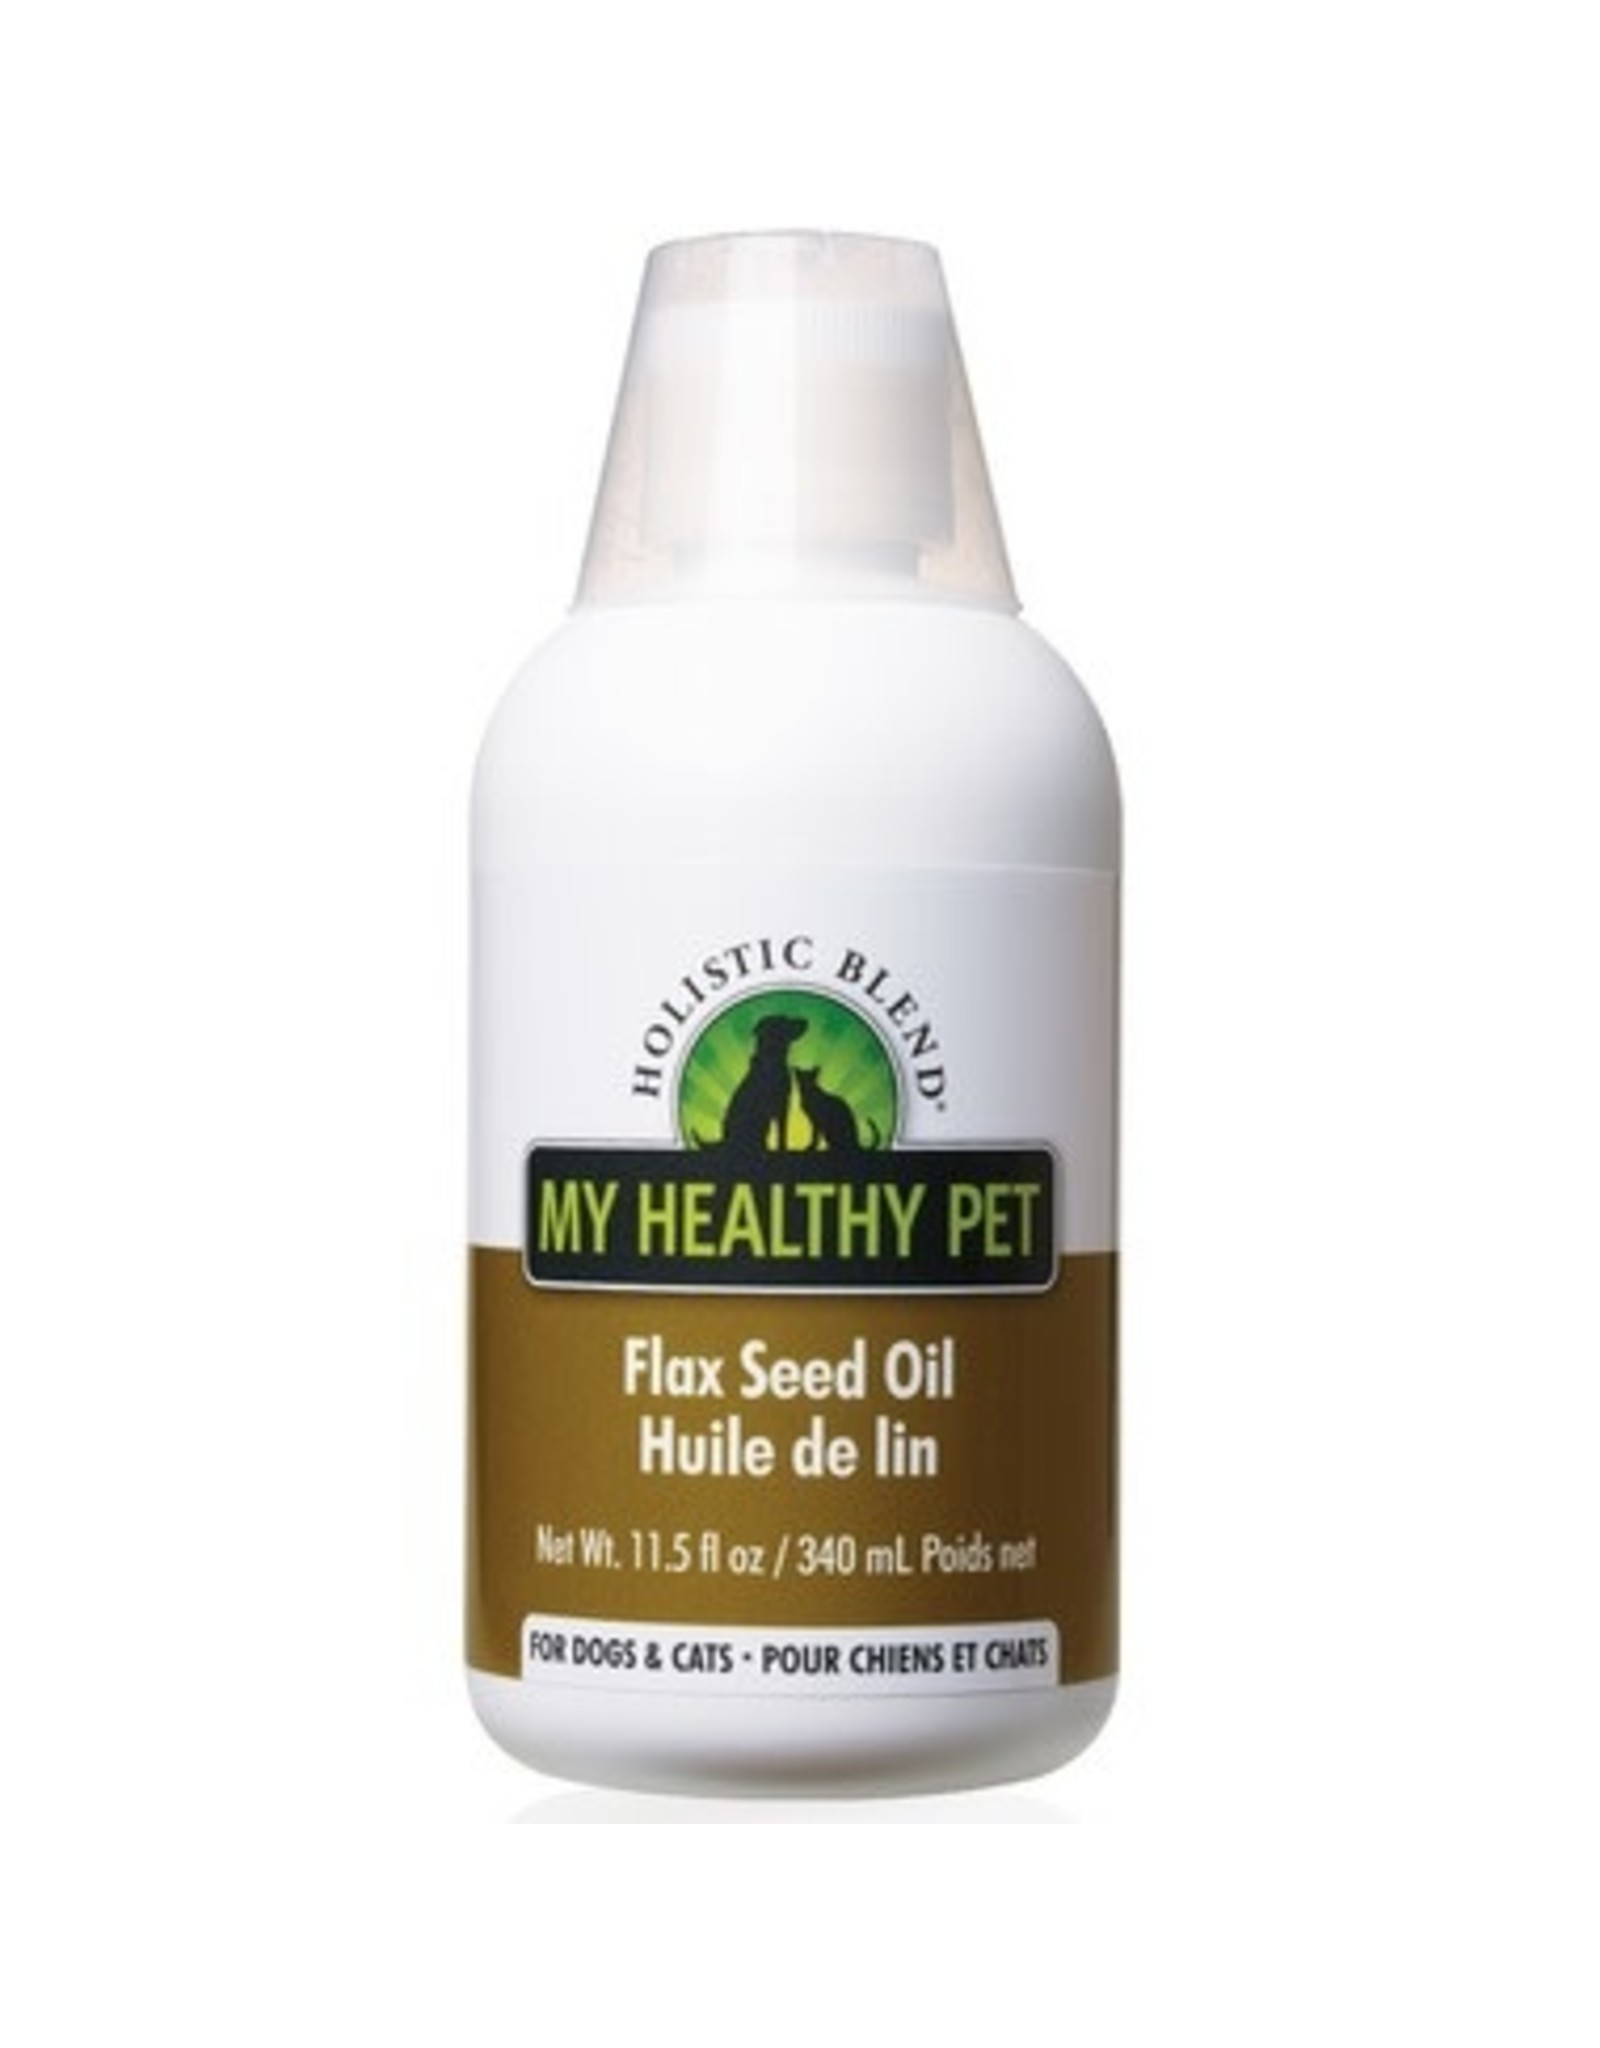 HOLISTIC BLEND My Healthy Pet - Flax Seed Oil 11.5oz